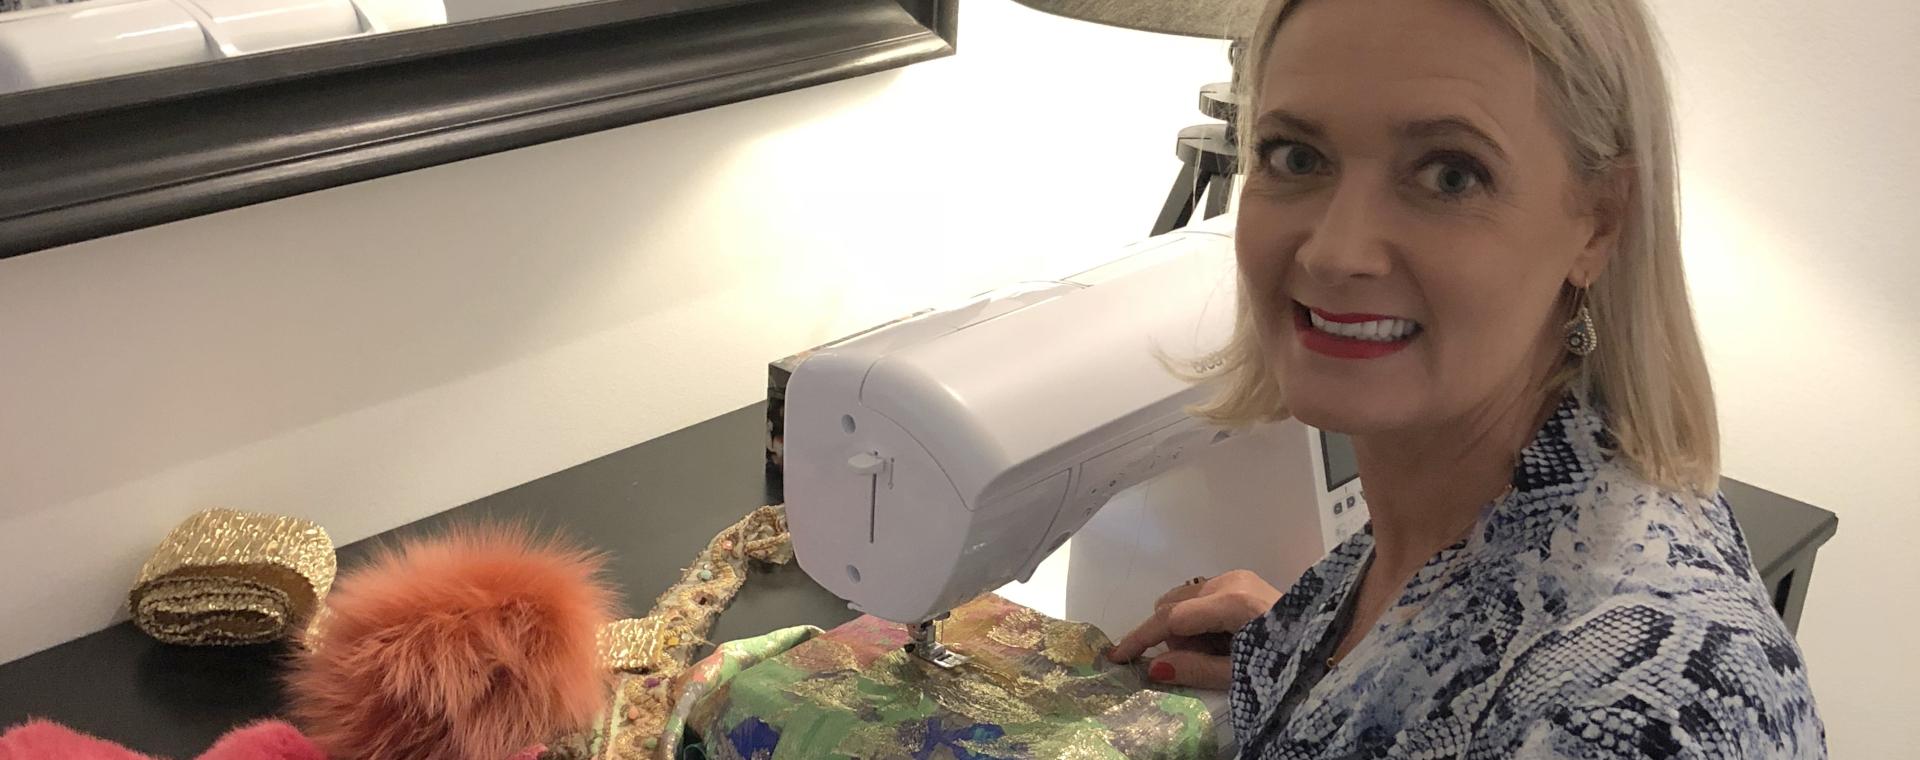 Jannie ved symaskine